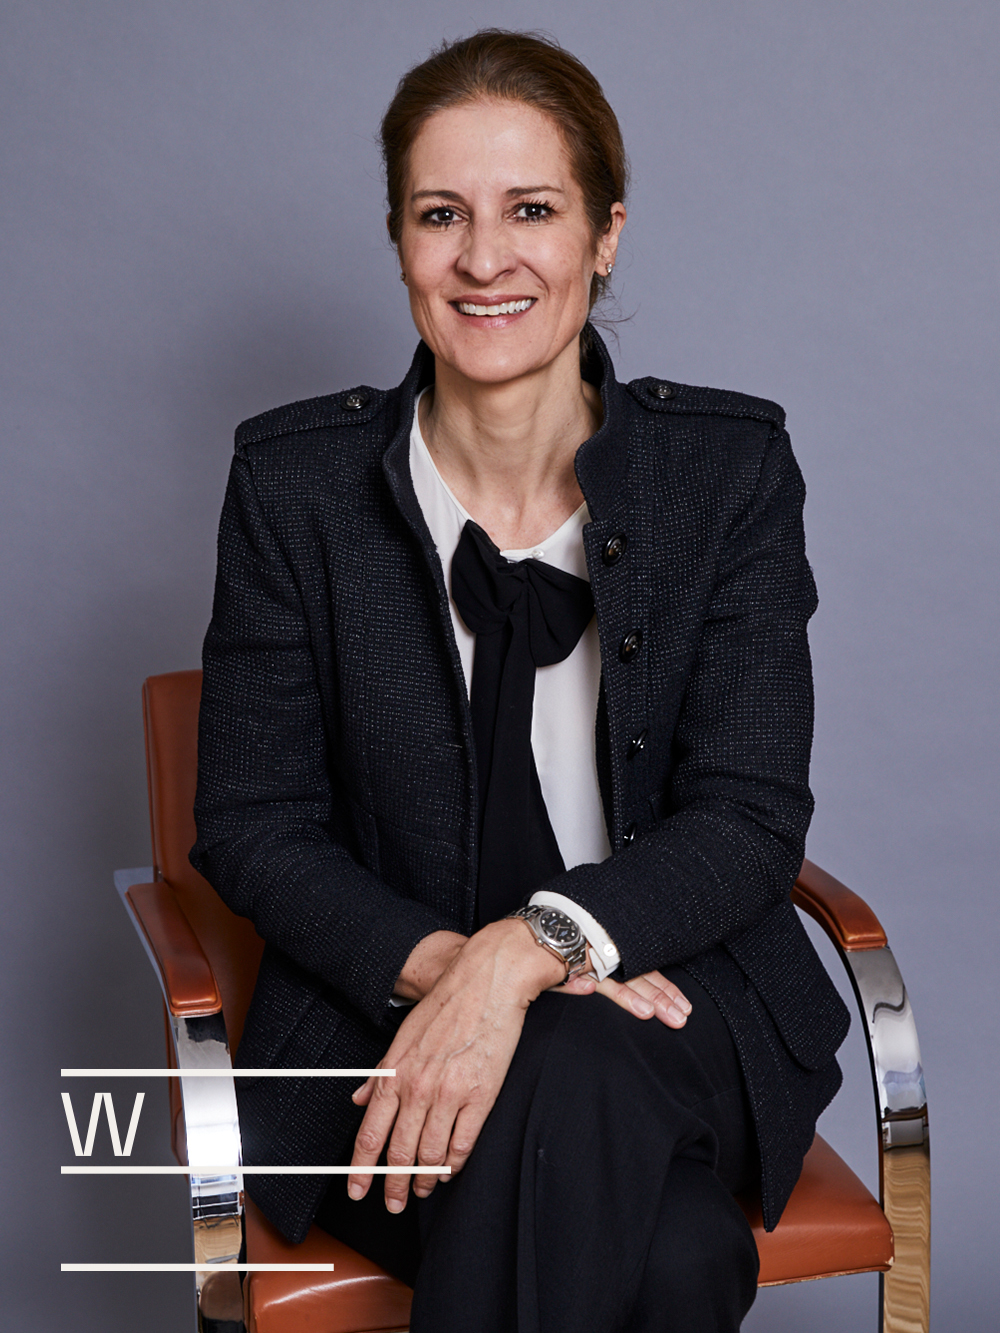 Dr-Monika-Wildner-neu2018.jpg